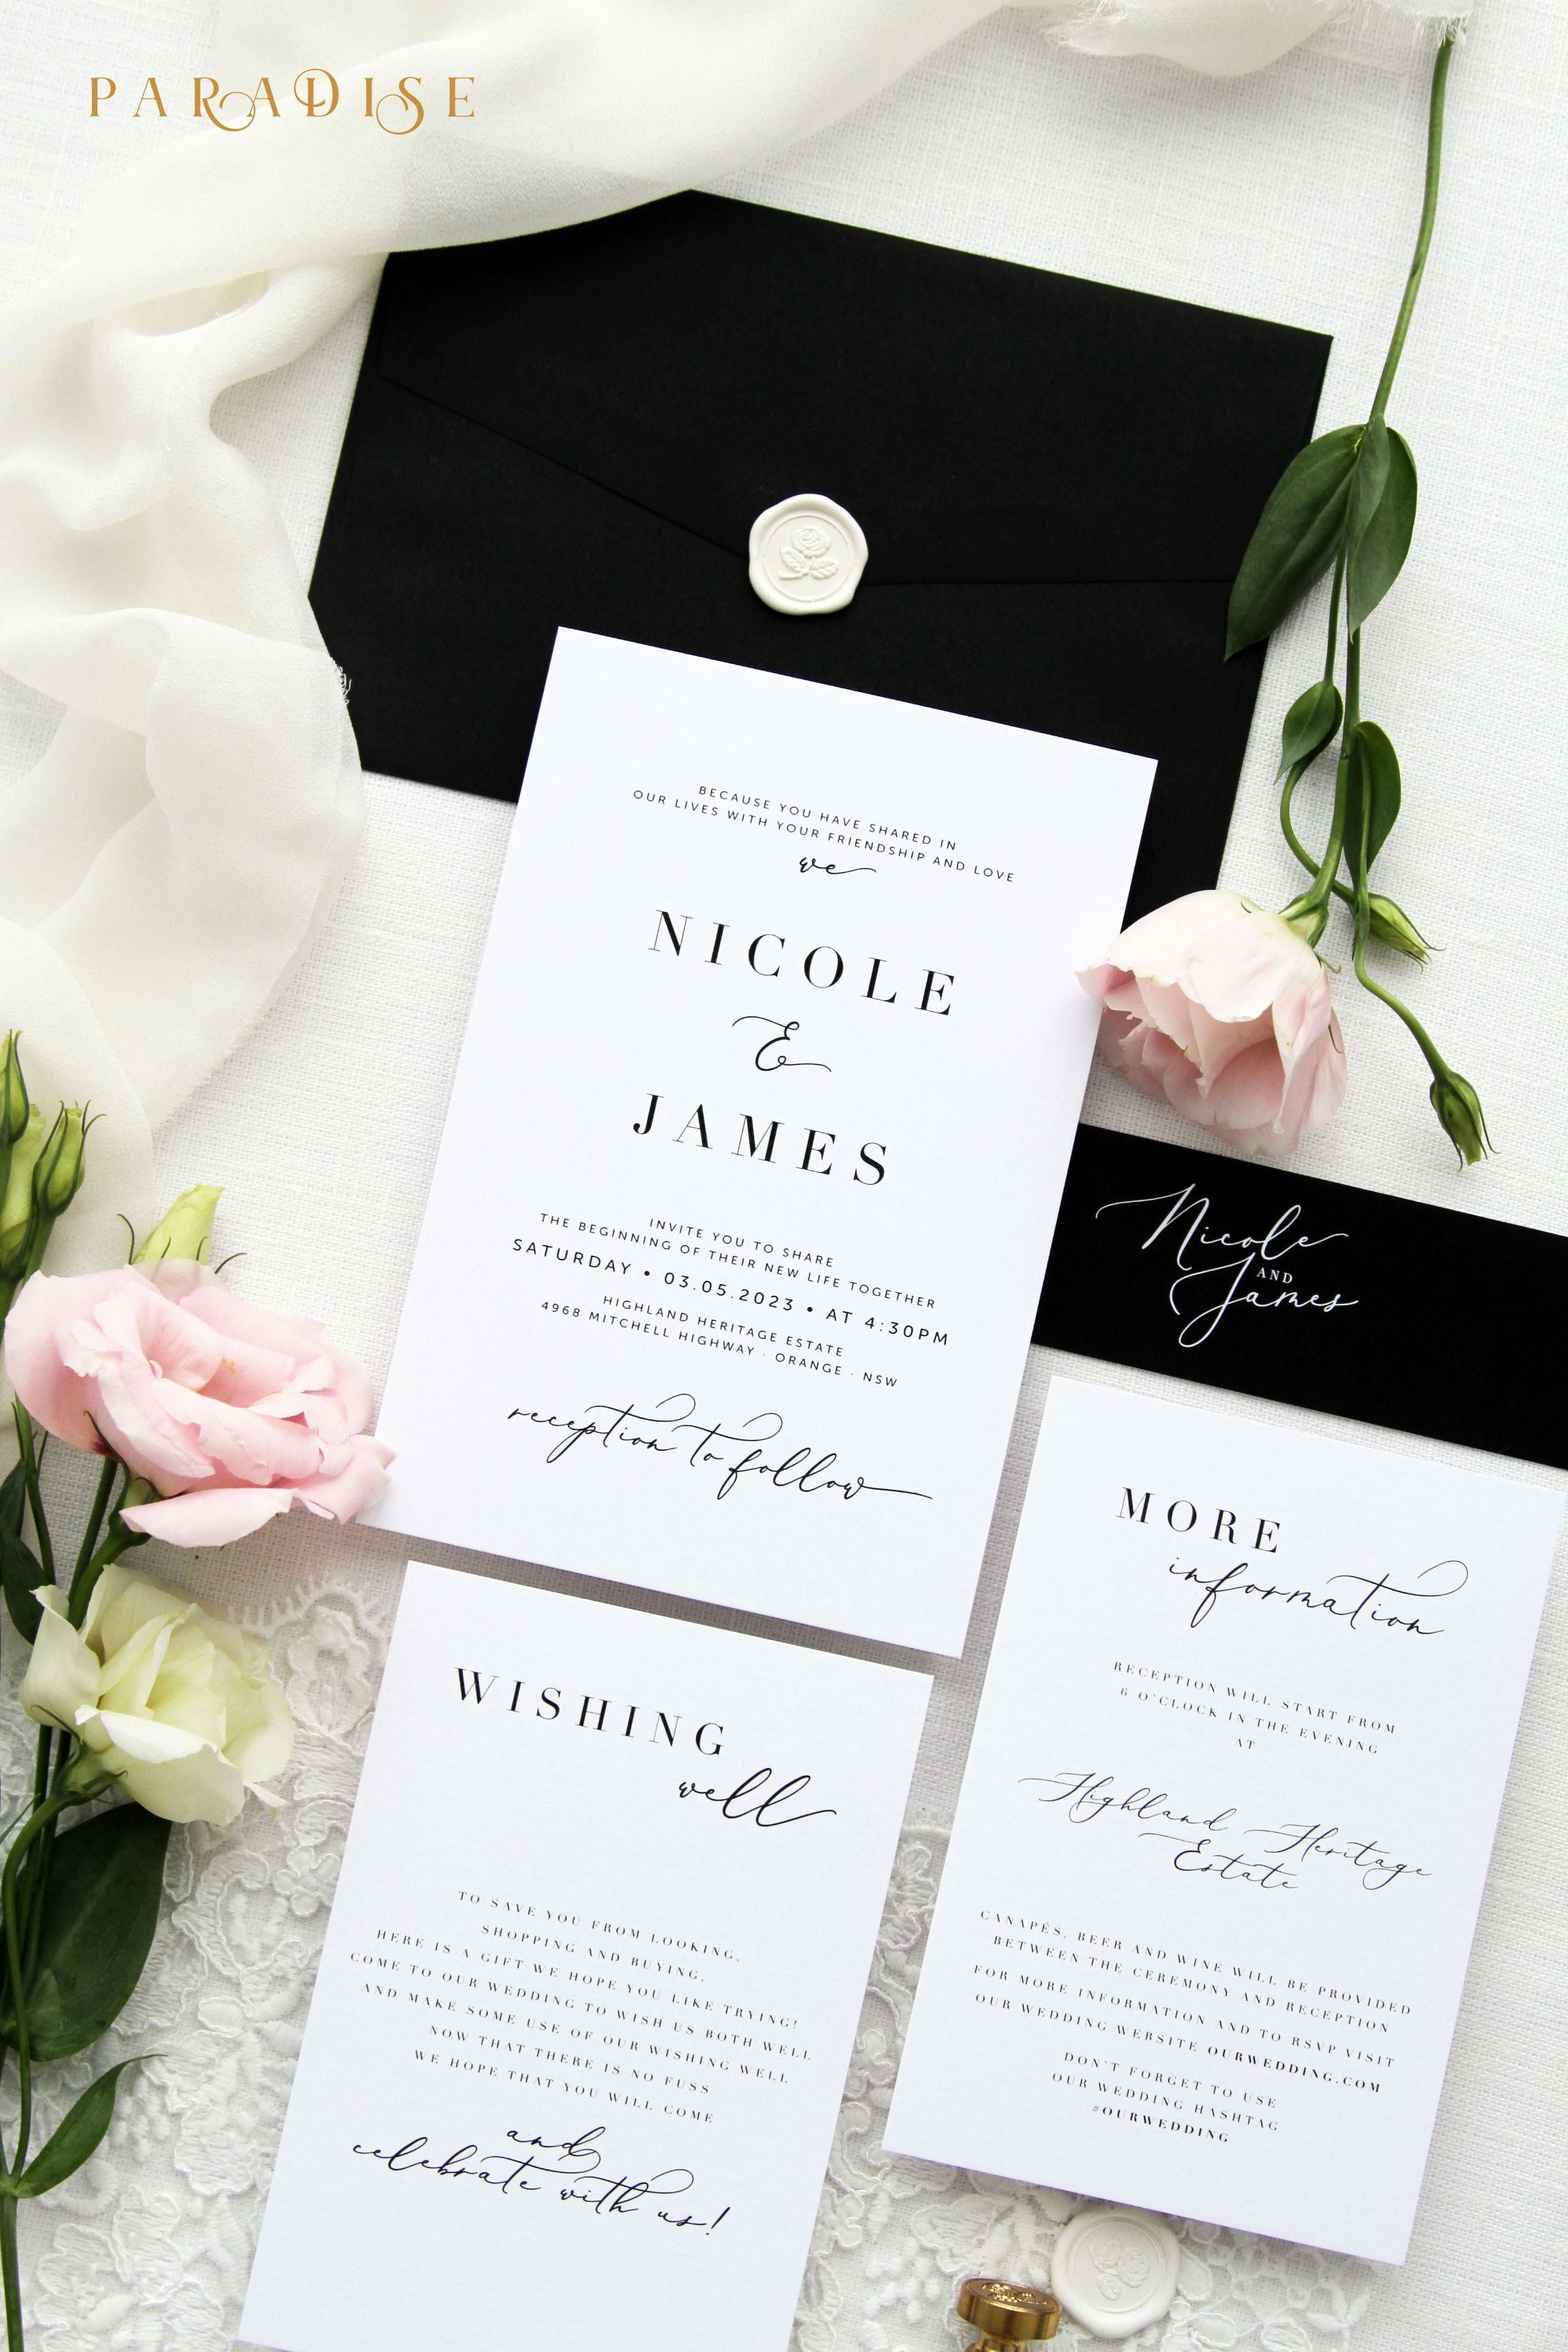 Wedding Invitations Near Me In 2020 Cheap Wedding Invitations Calligraphy Wedding Invitation Modern Wedding Invitations